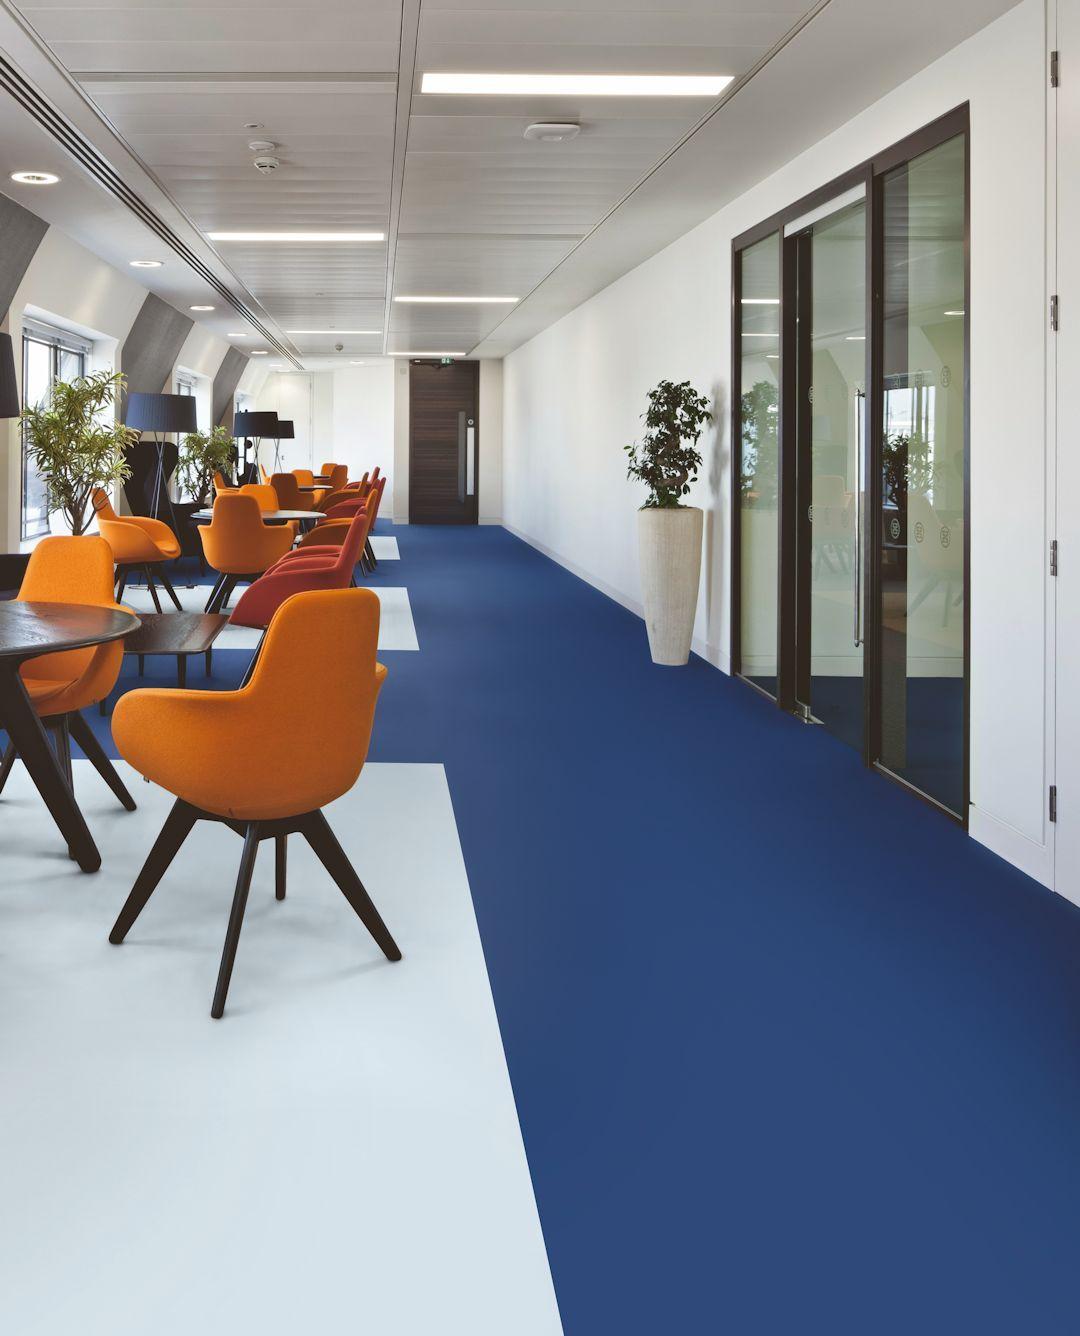 Polyflor Bloc Pur In Marine Blue And Cool Breeze Luxury Vinyl Tile Flexible Tile Vinyl Flooring